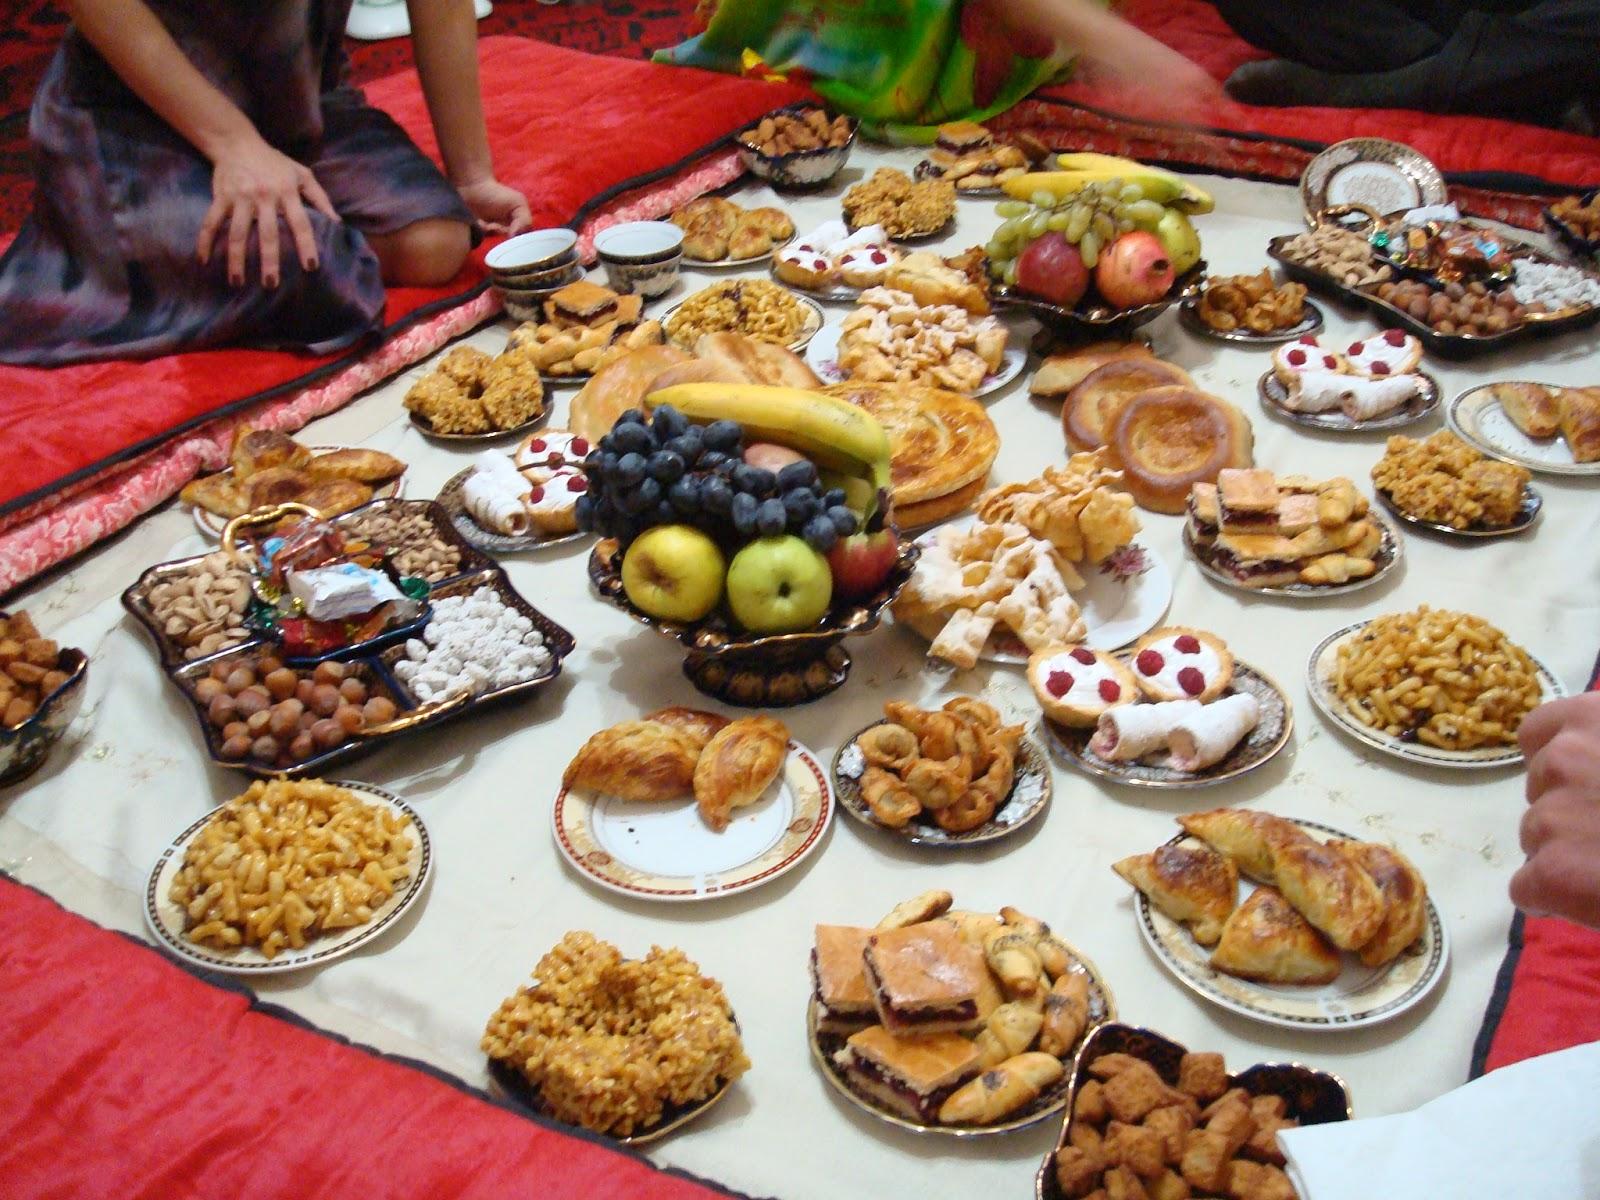 macam - macam makanan tradisional indonesia